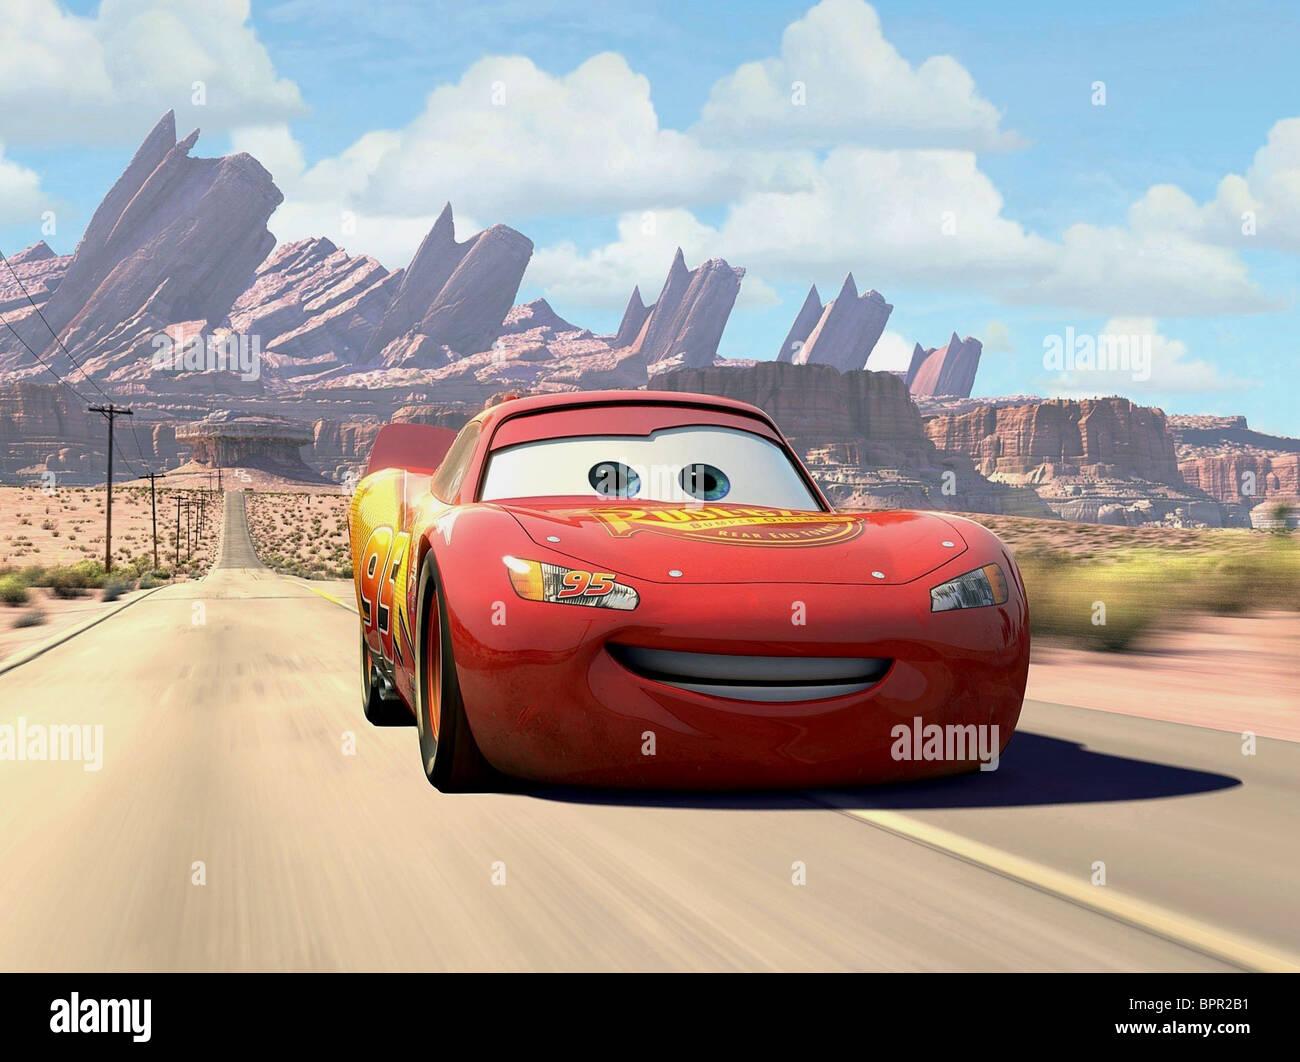 Lightning Mcqueen Cars 2006 Stockfoto Bild 31239573 Alamy